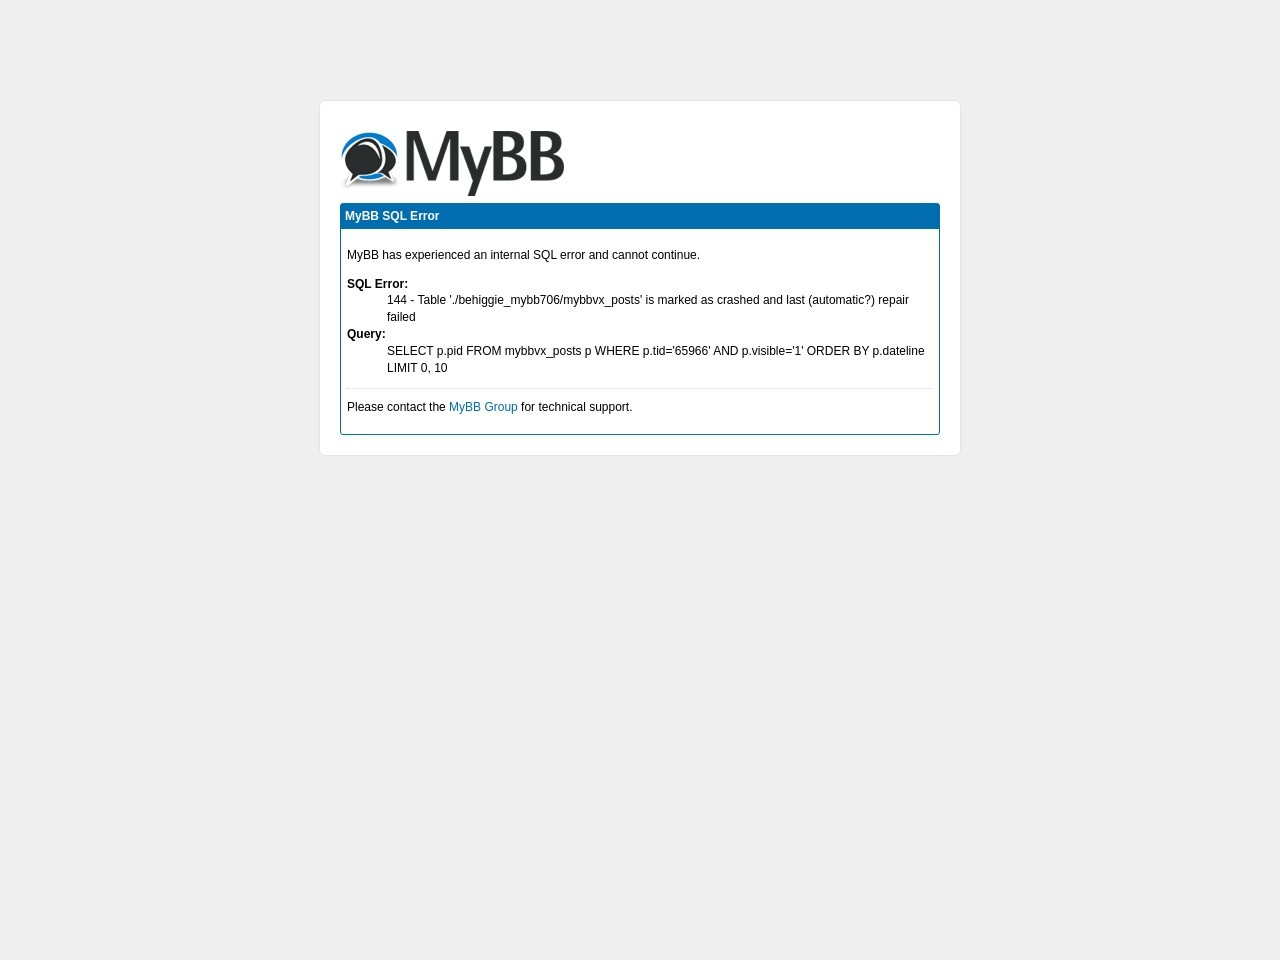 cleanmymac x activation code 2019